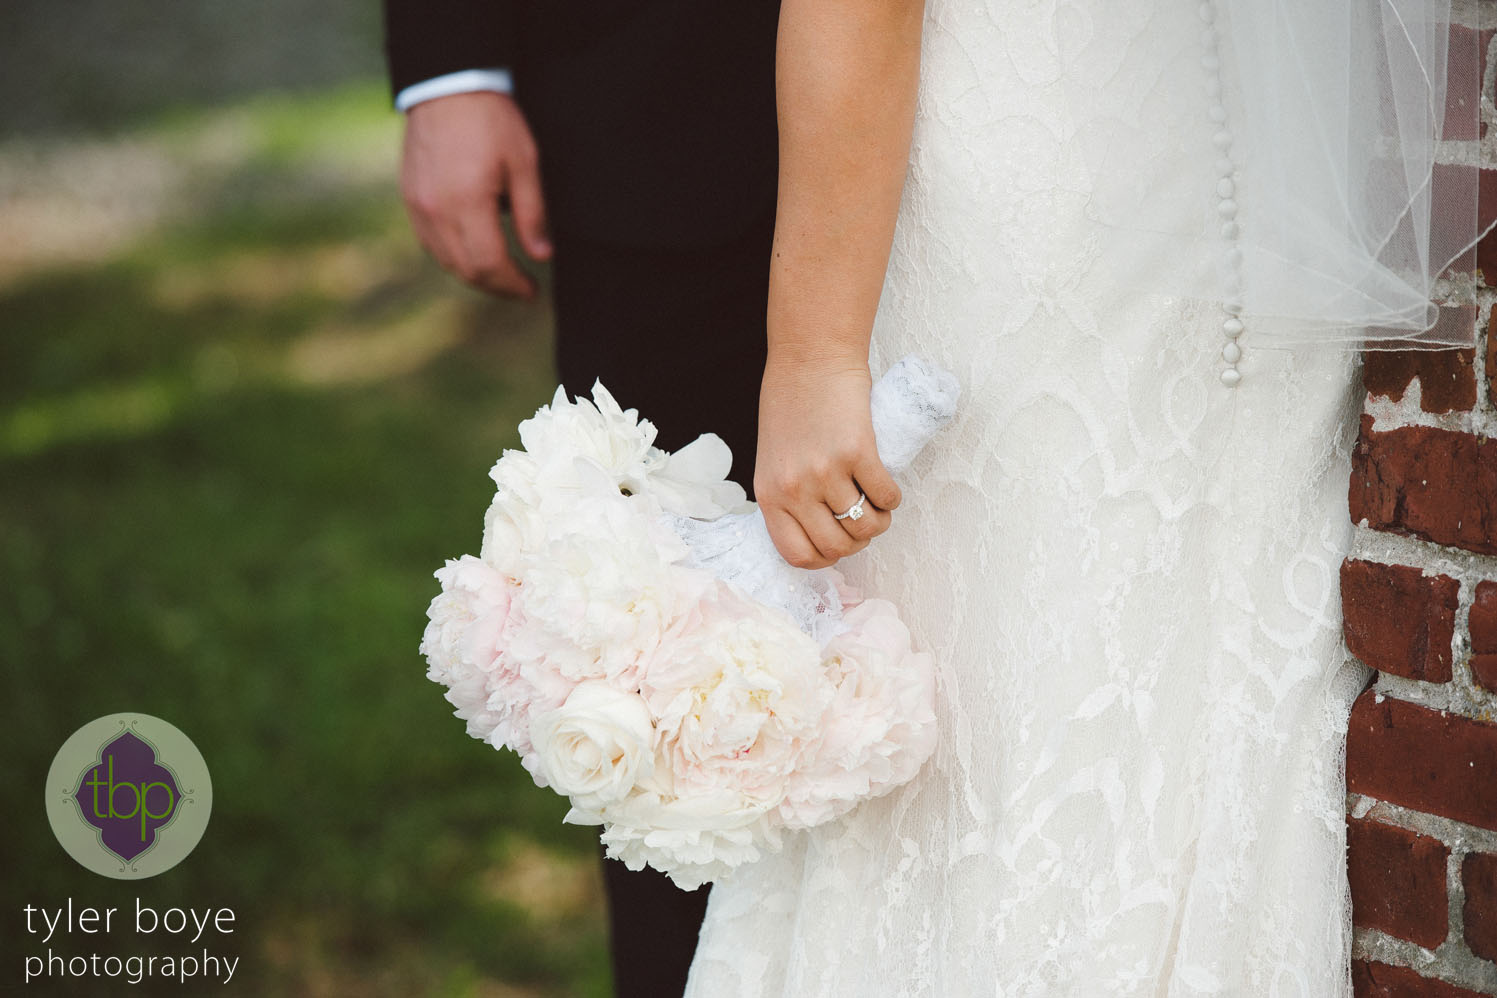 Tyler Boye Photography  | Wedding Reception | The Manor House at Propechy Creek, Ambler, PA